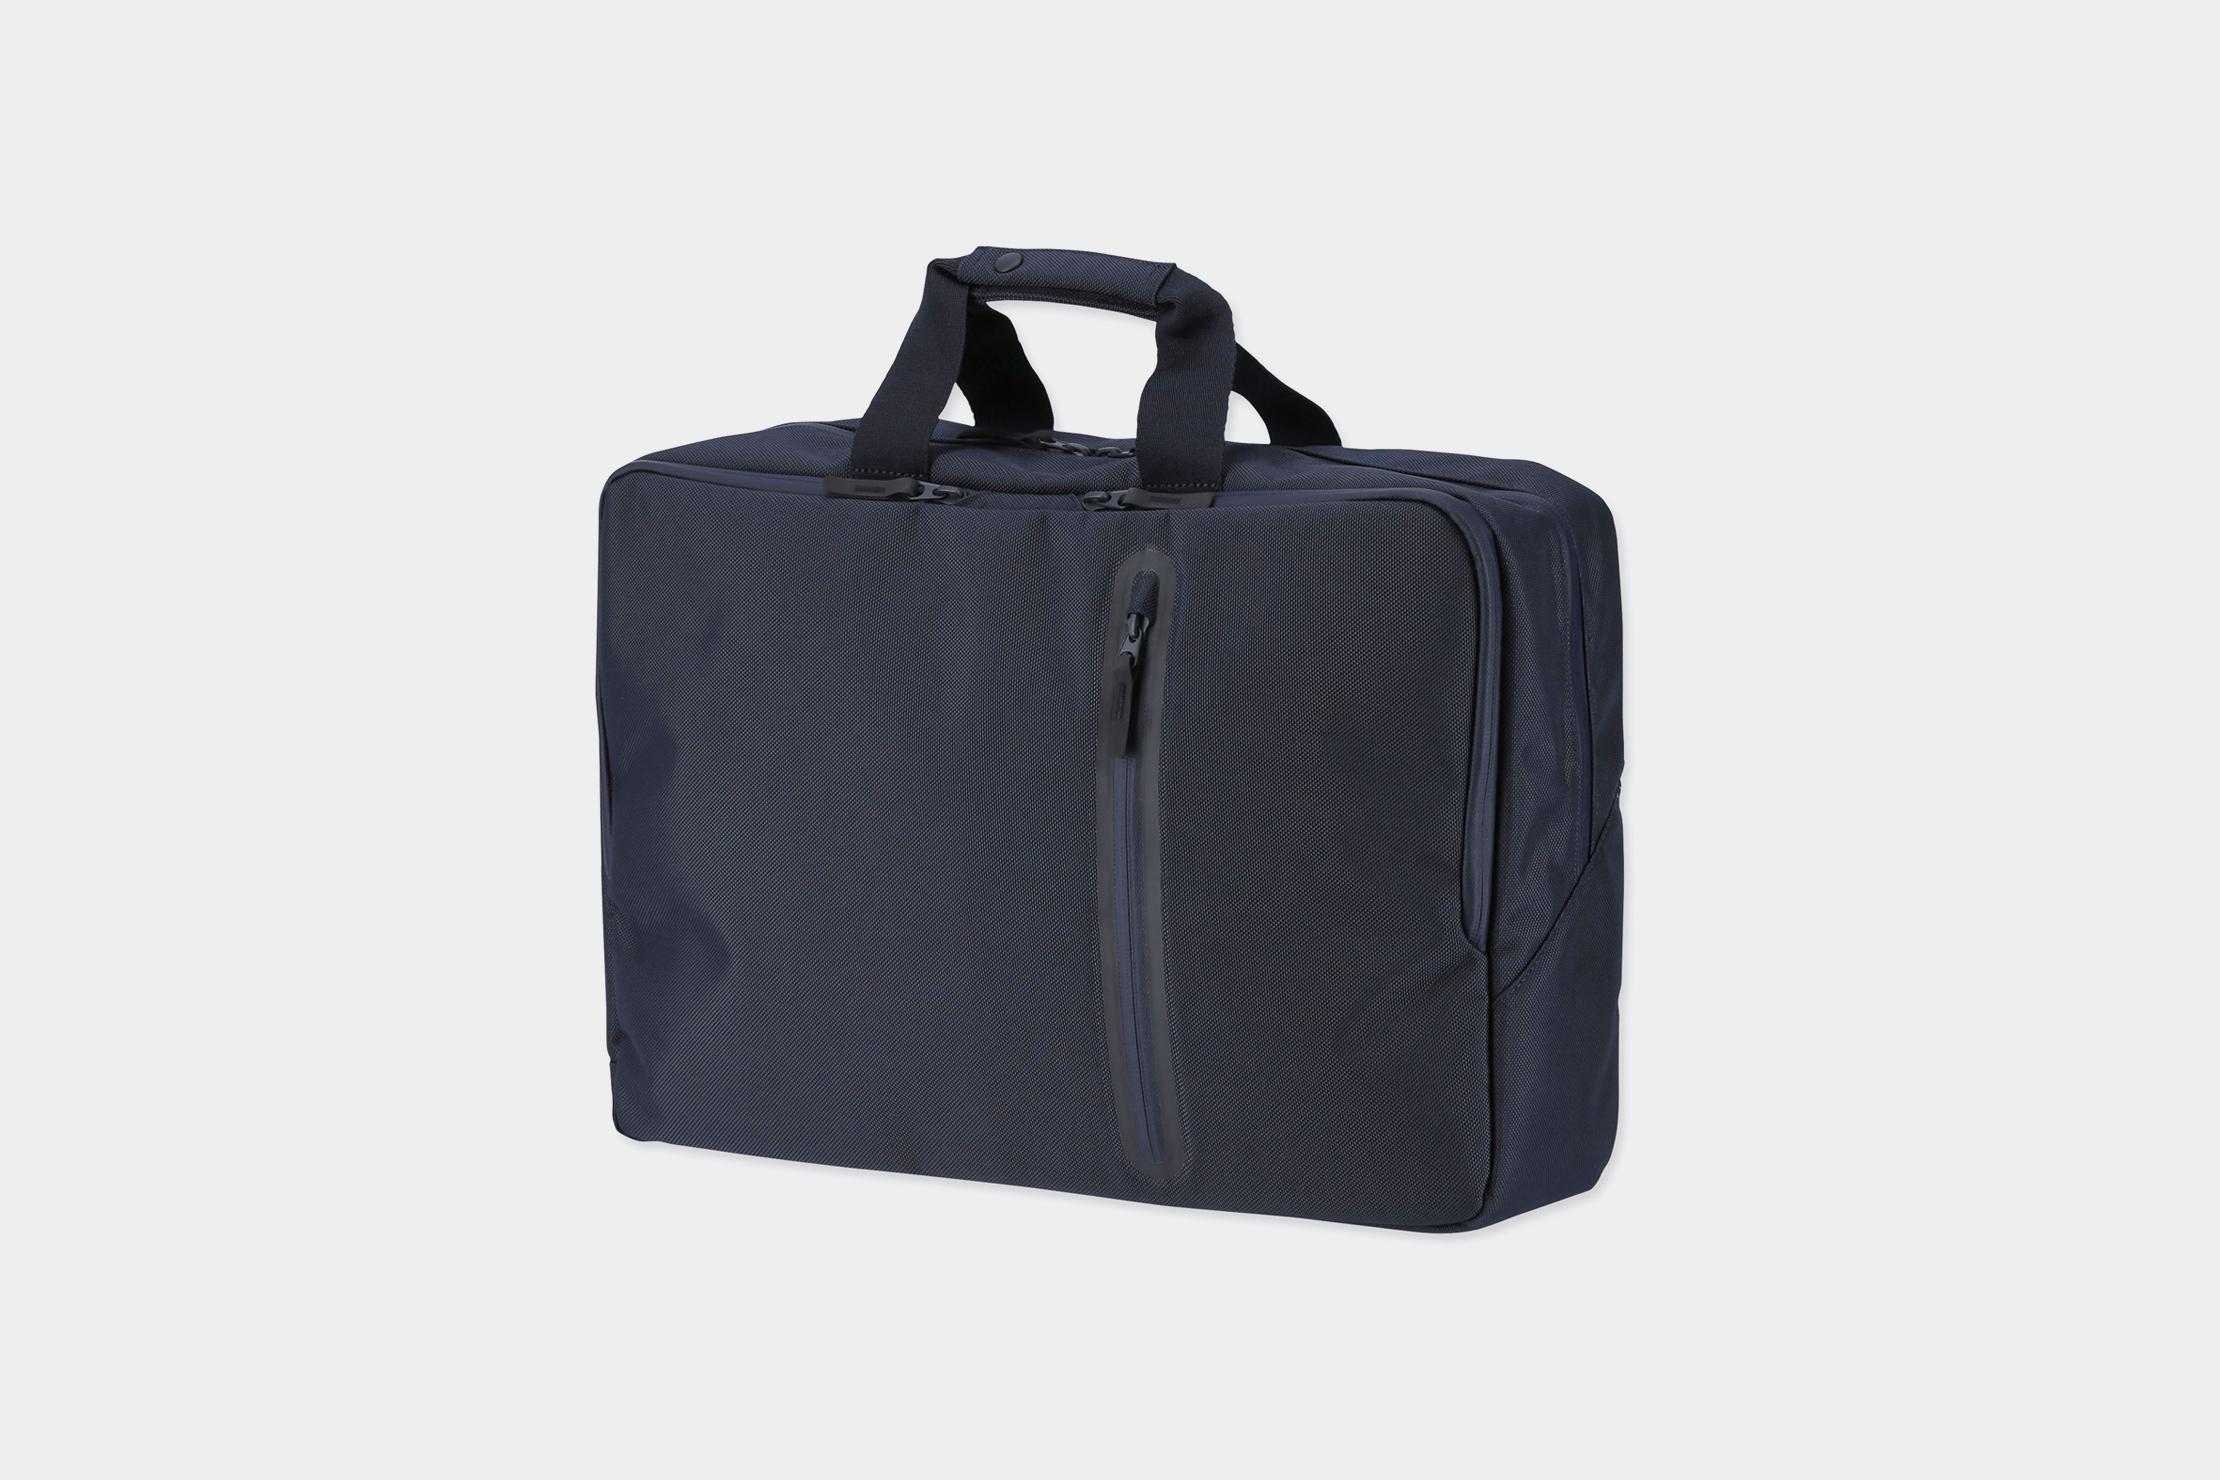 Uniqlo 3 Way Bag Review Budget